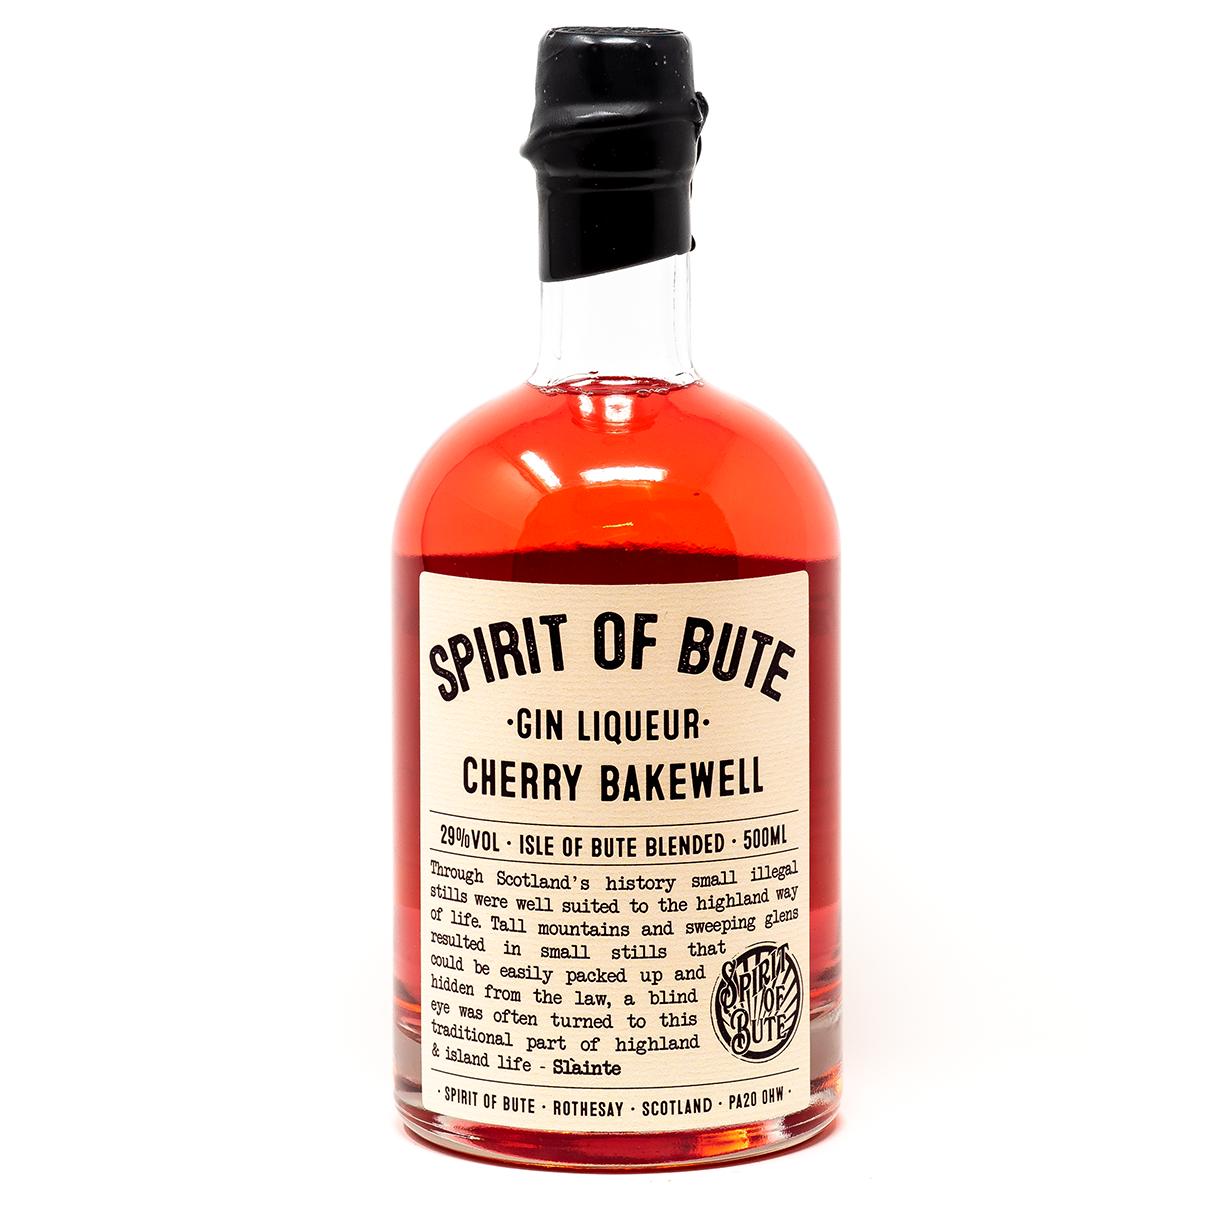 SOB Gin Liqueur (Cherry Bakewell)